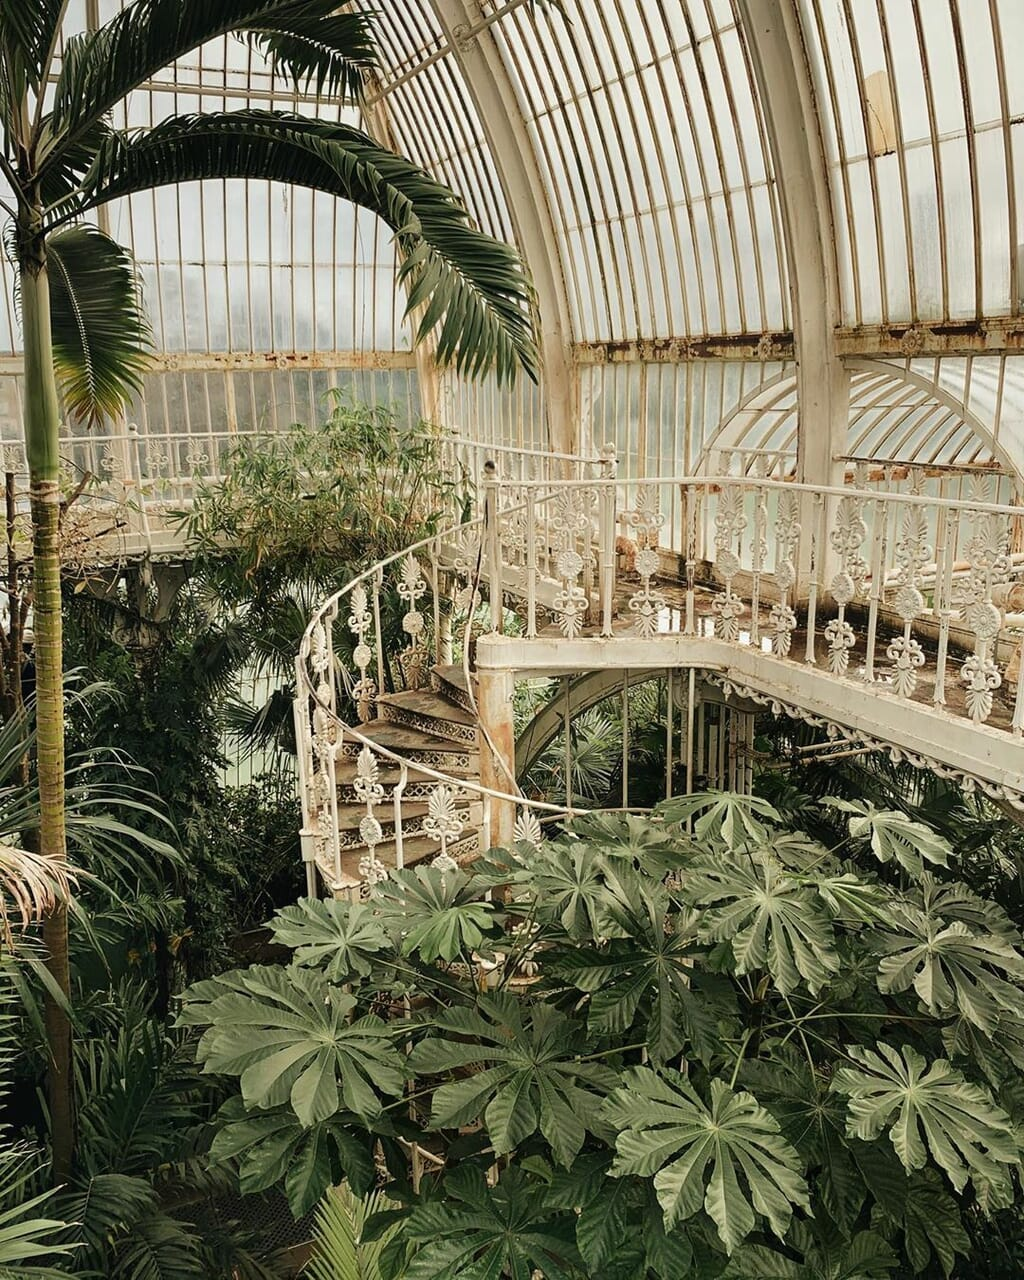 Royal Botanic Gardens Kew By Folia Folia On We Heart It